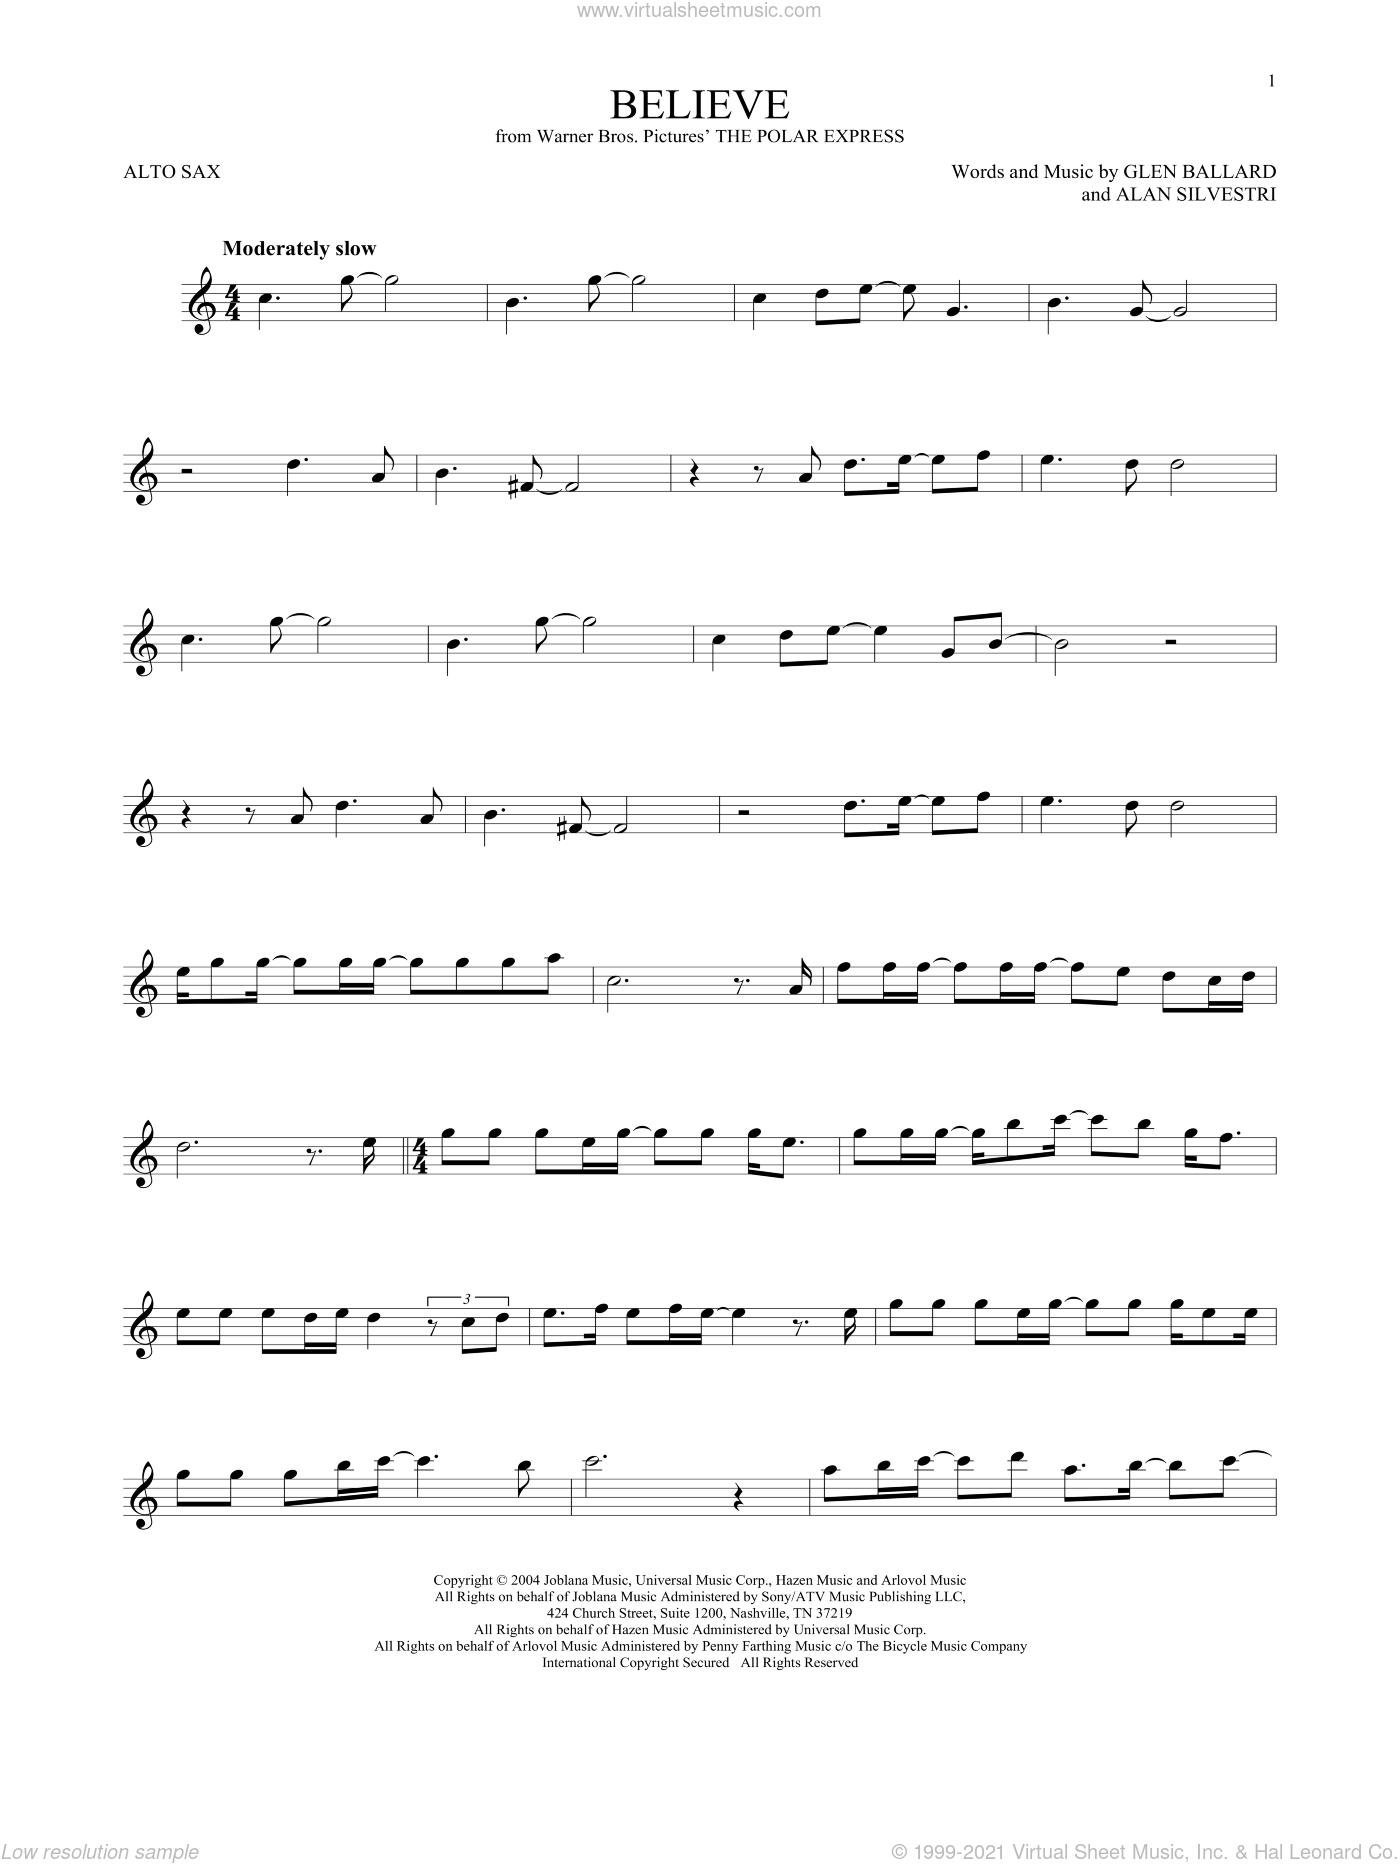 Believe (from The Polar Express) sheet music for alto saxophone solo by Josh Groban, Alan Silvestri and Glen Ballard, intermediate skill level